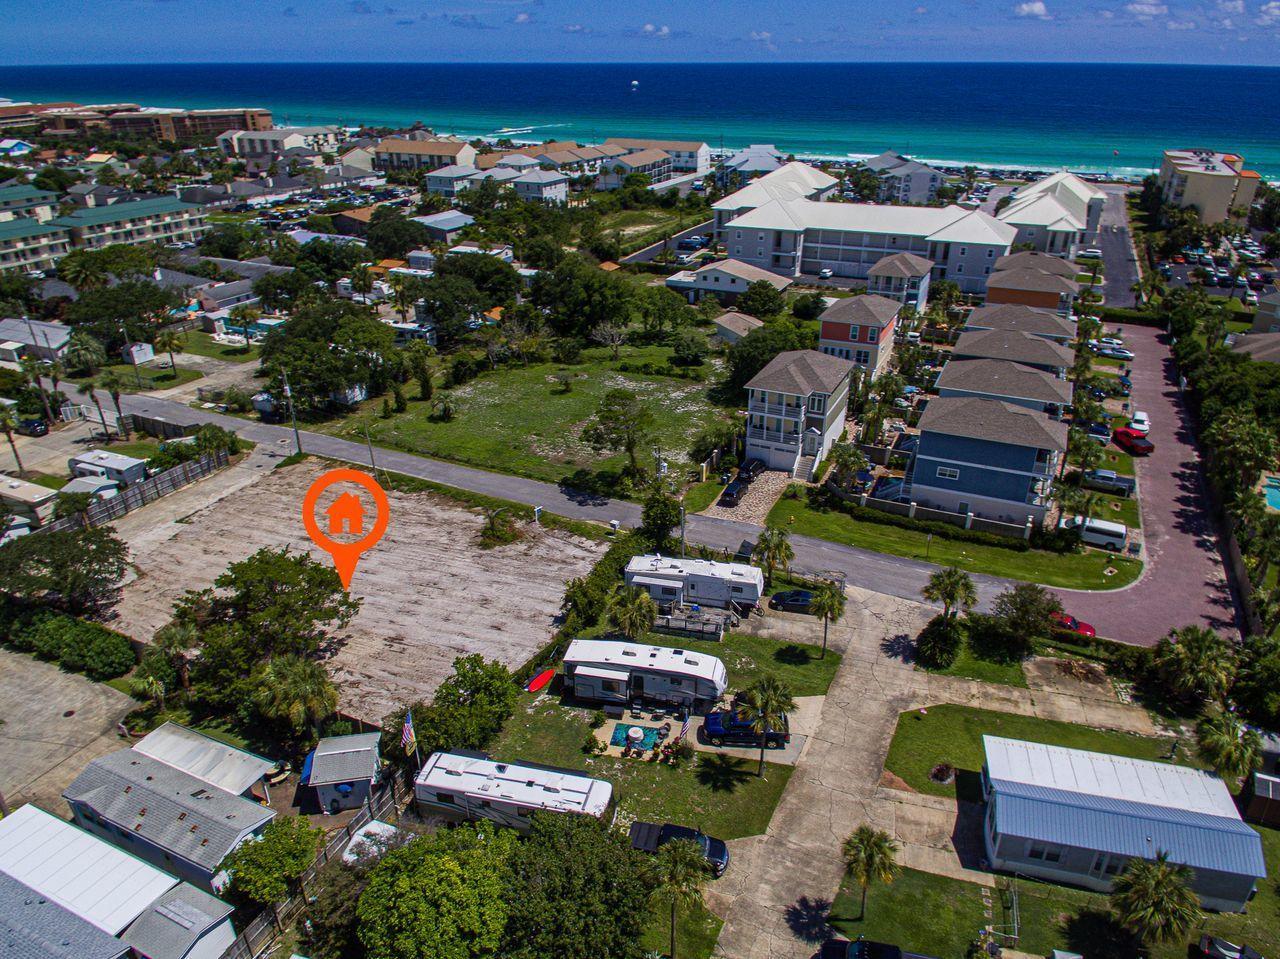 Photo of home for sale at TBD Payne, Miramar Beach FL